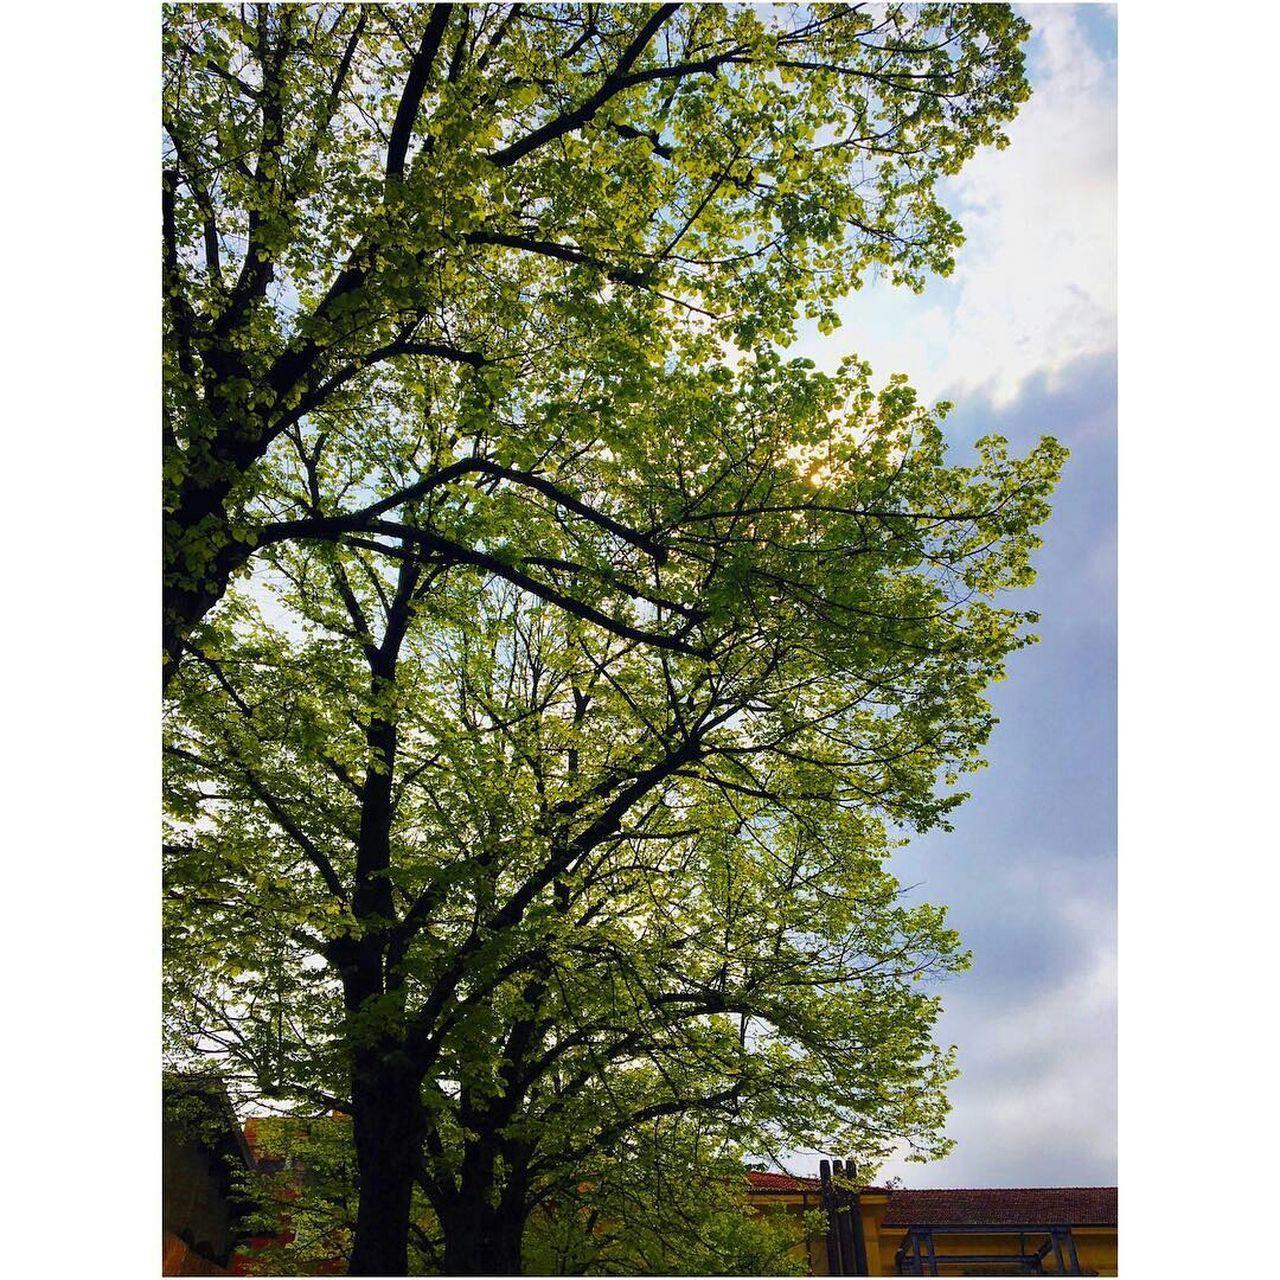 Paisaje.🍀 Tree Nature Growth No People Green Color Day Beauty In Nature Sky Low Angle View Outdoors Maravillas De La Naruraleza First Eyeem Photo